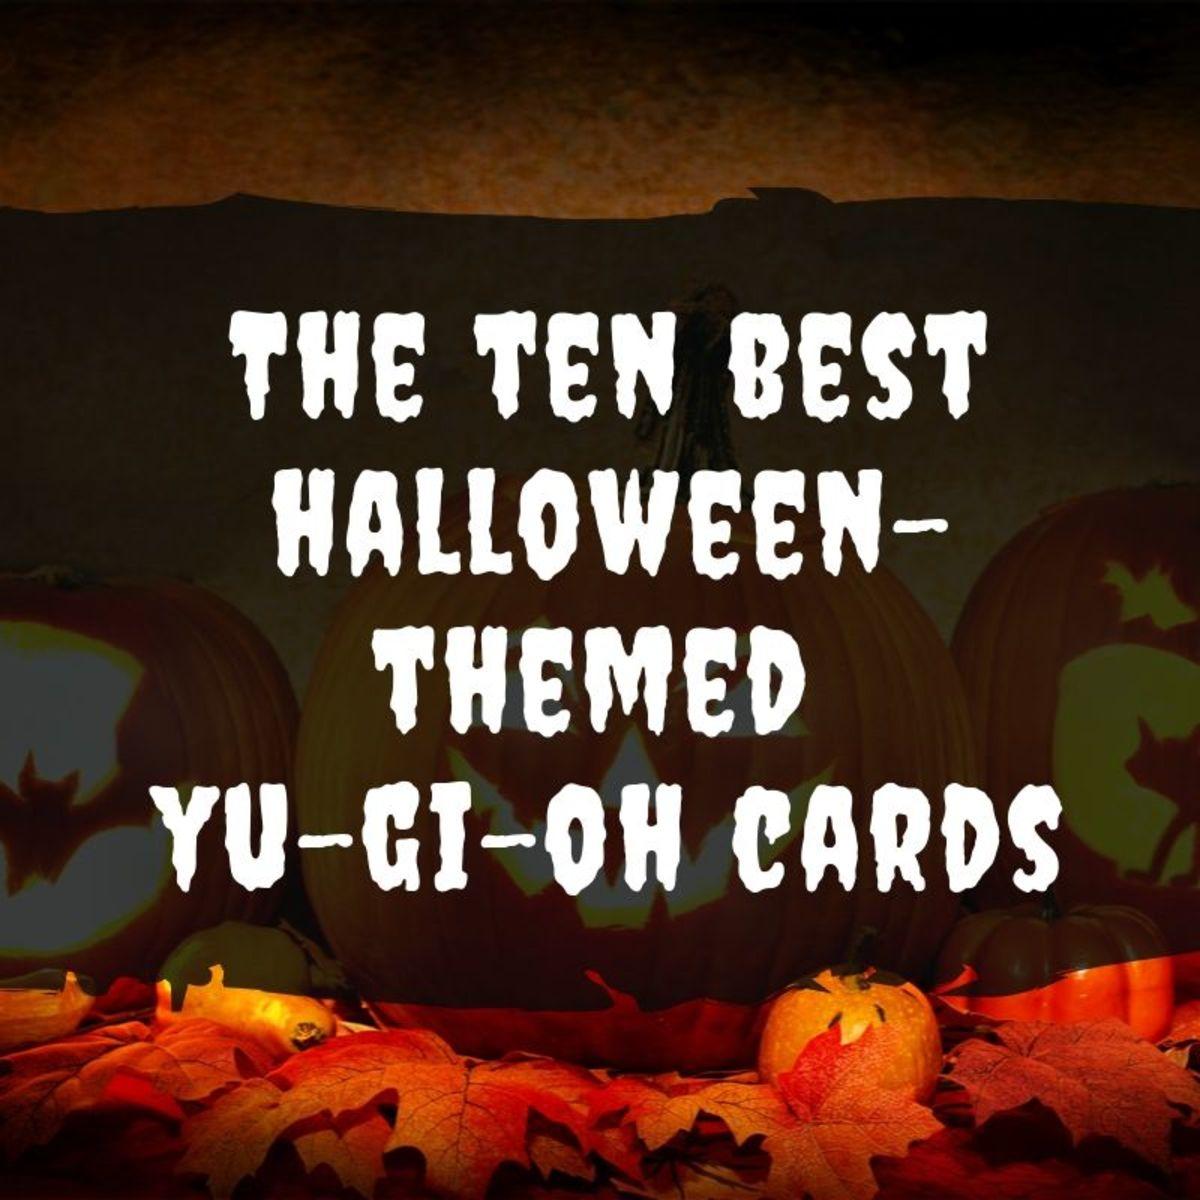 Top 10 Halloween-Themed Yu-Gi-Oh Cards